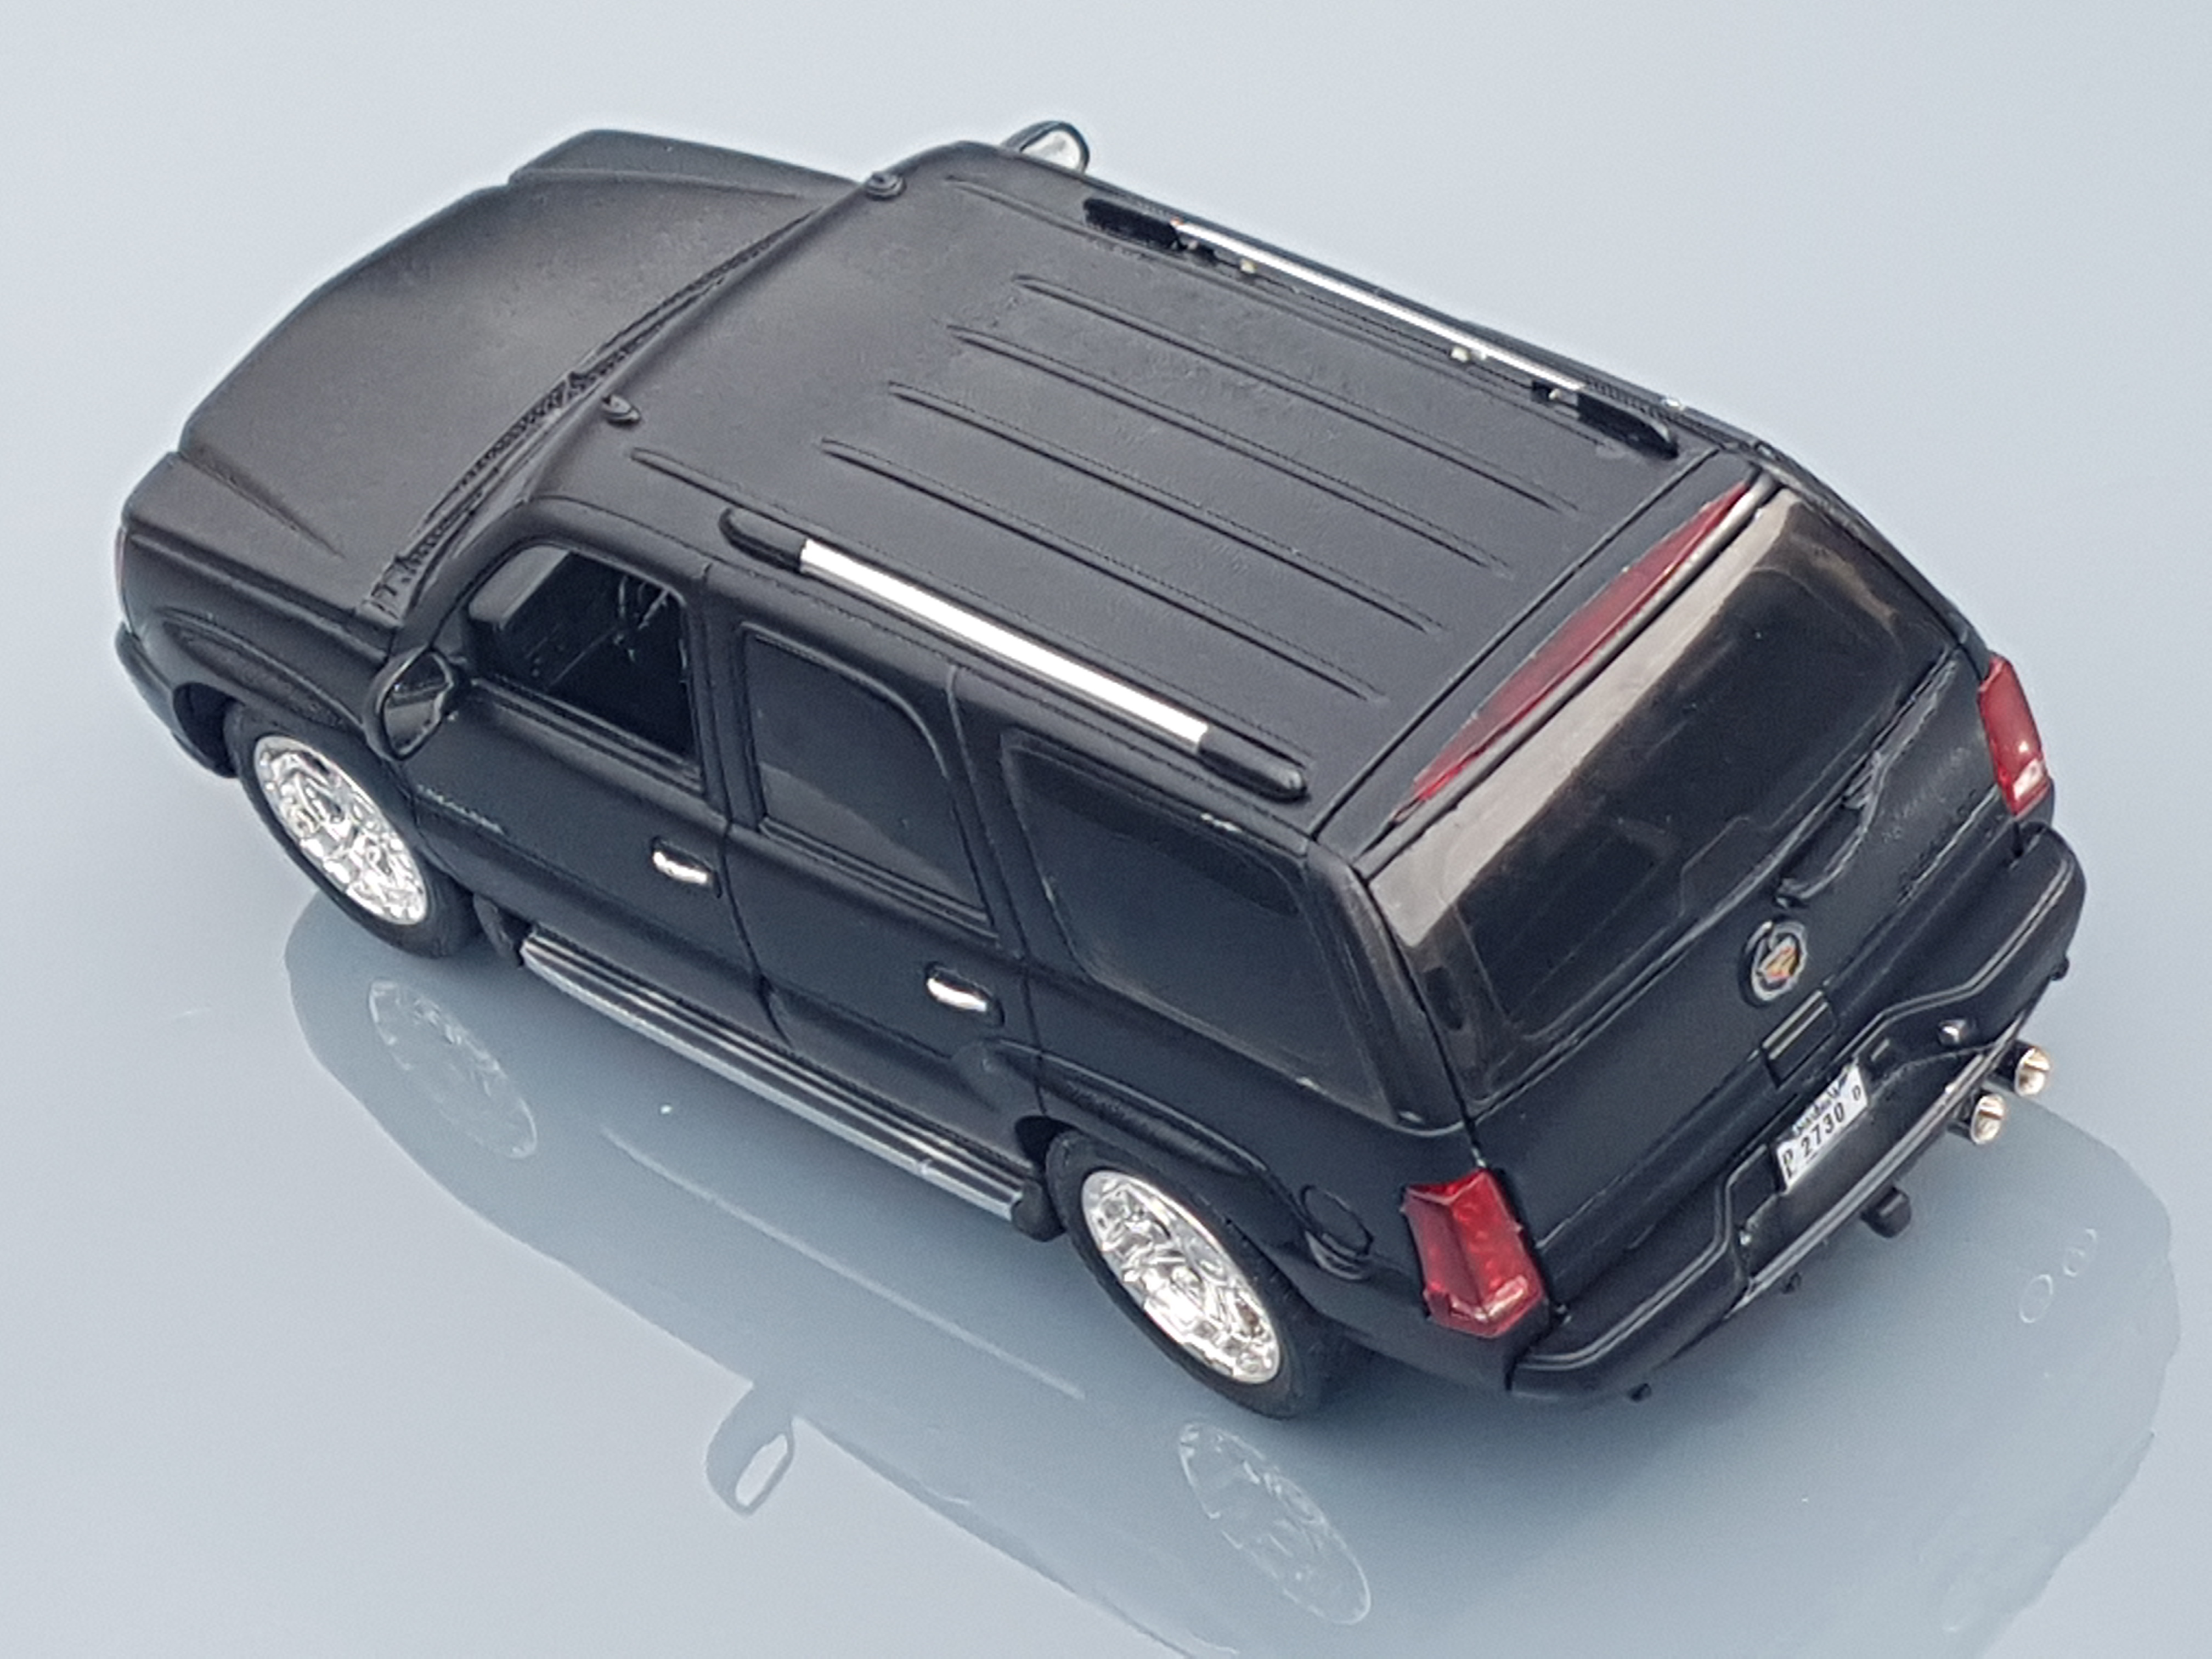 sale auto in for revo sales luxury ne cadillac vehicle city fremont escalade js